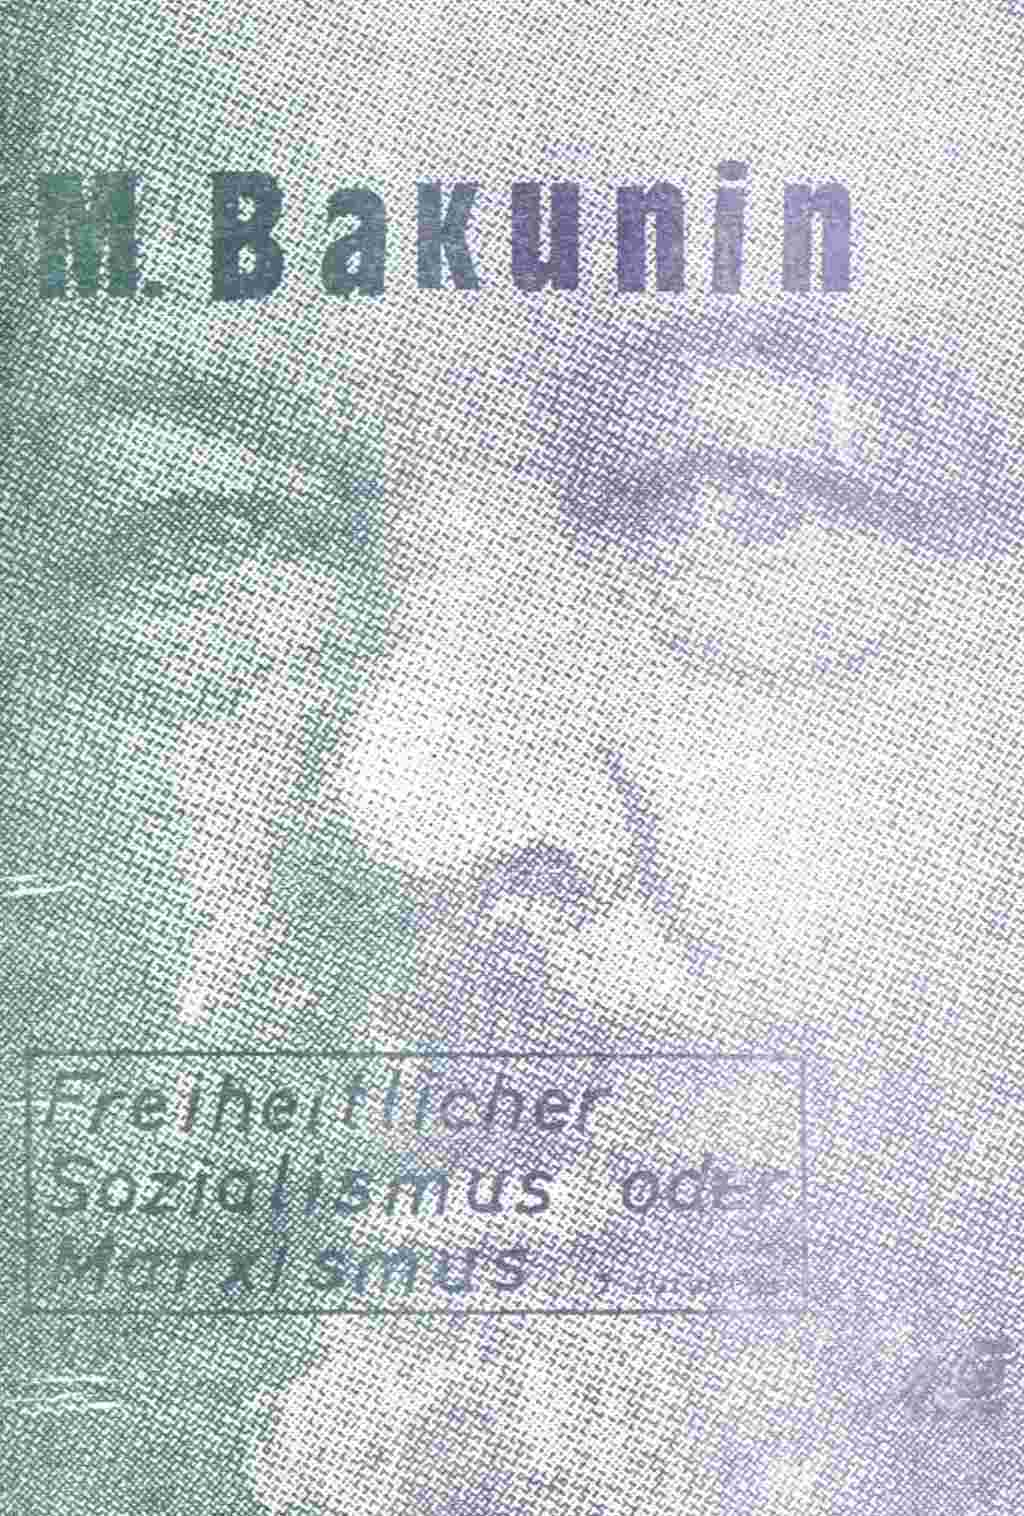 Bakunin Sozialismus